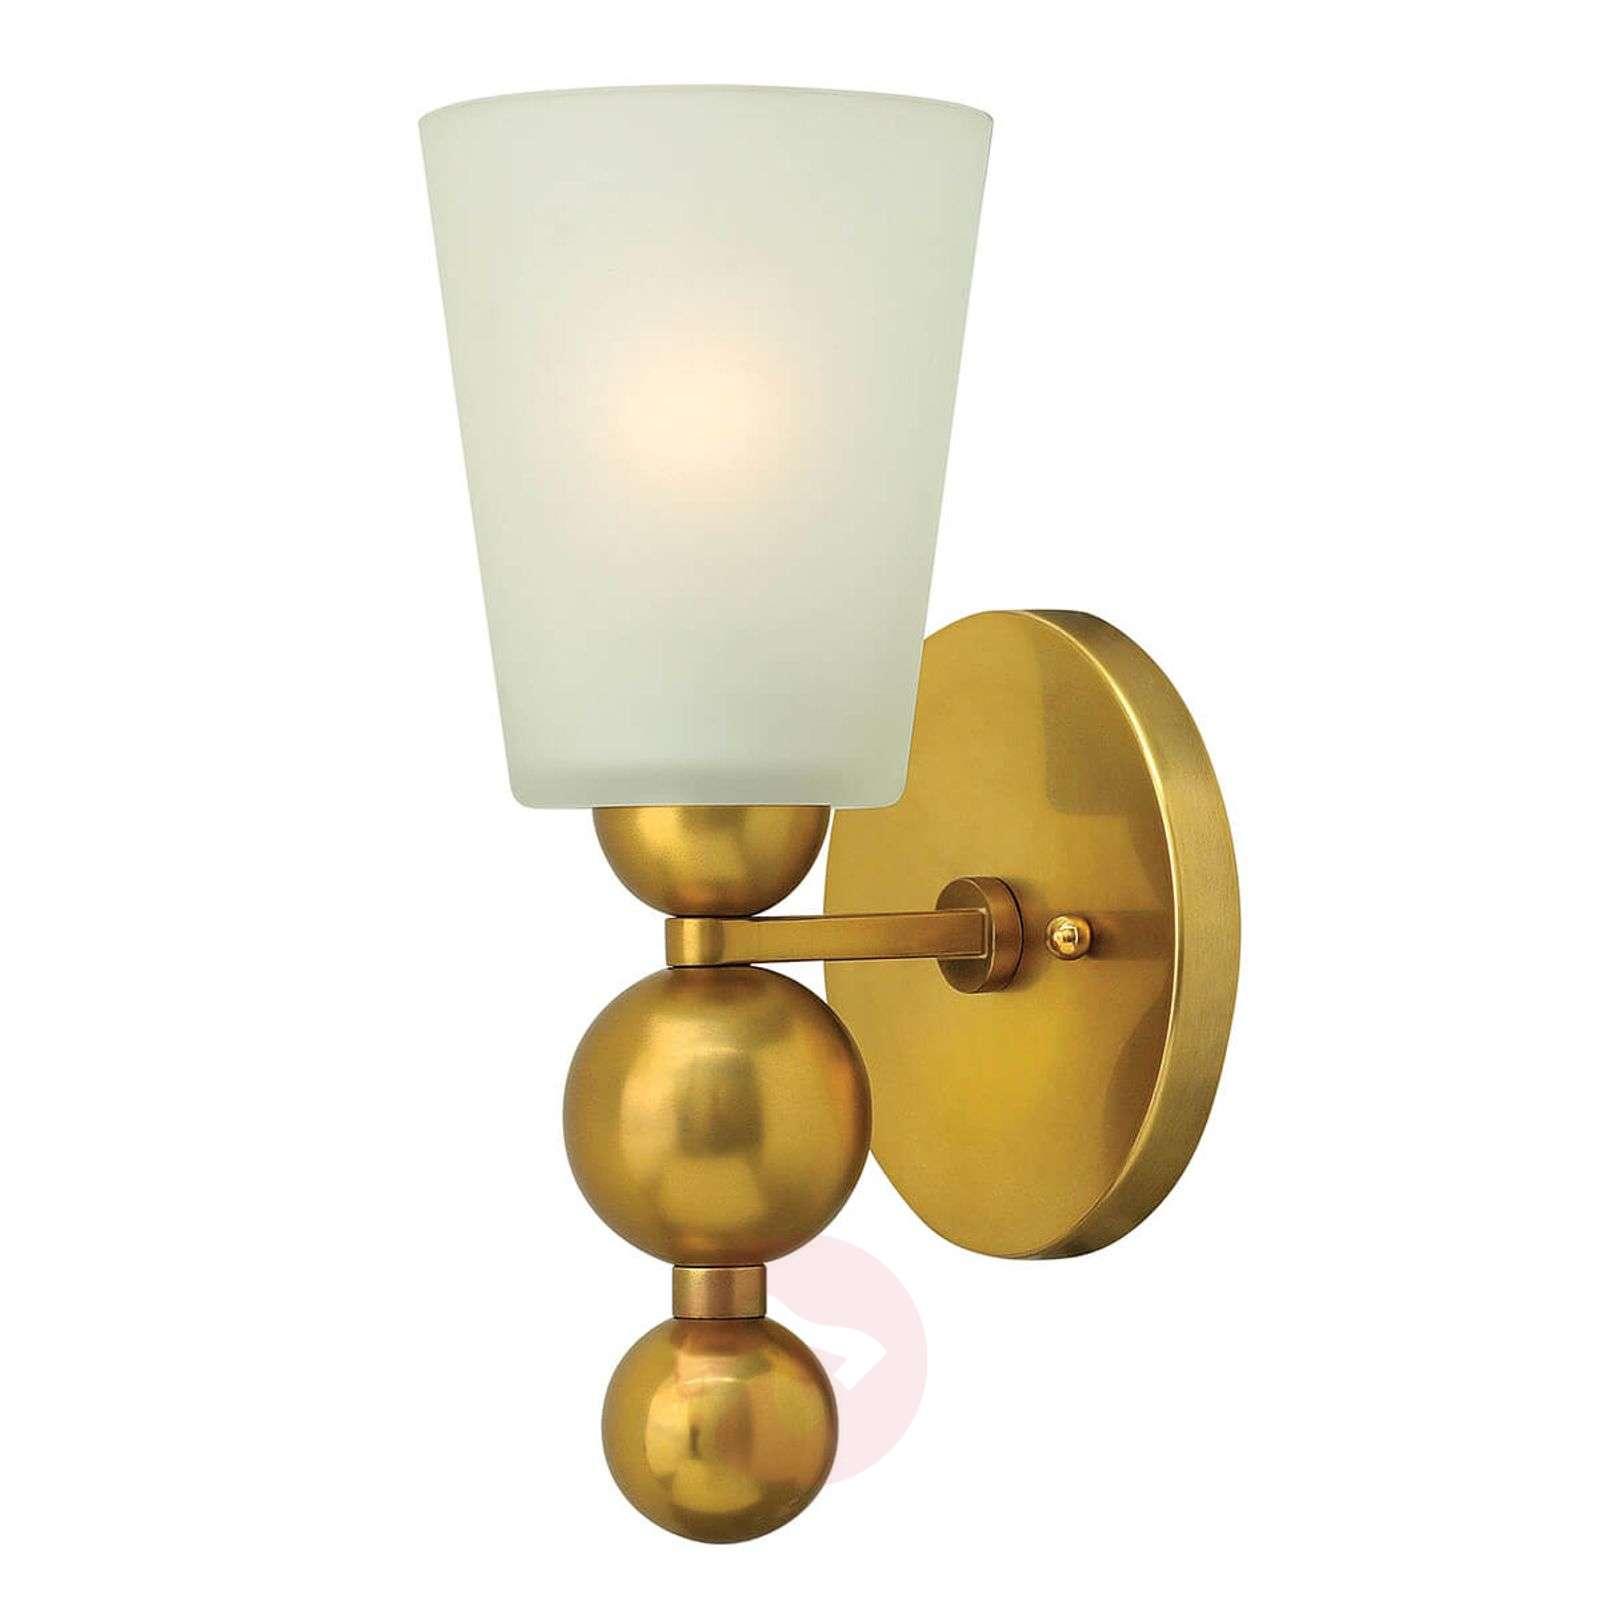 Antique brass-coloured wall lamp Zelda-3048478-01